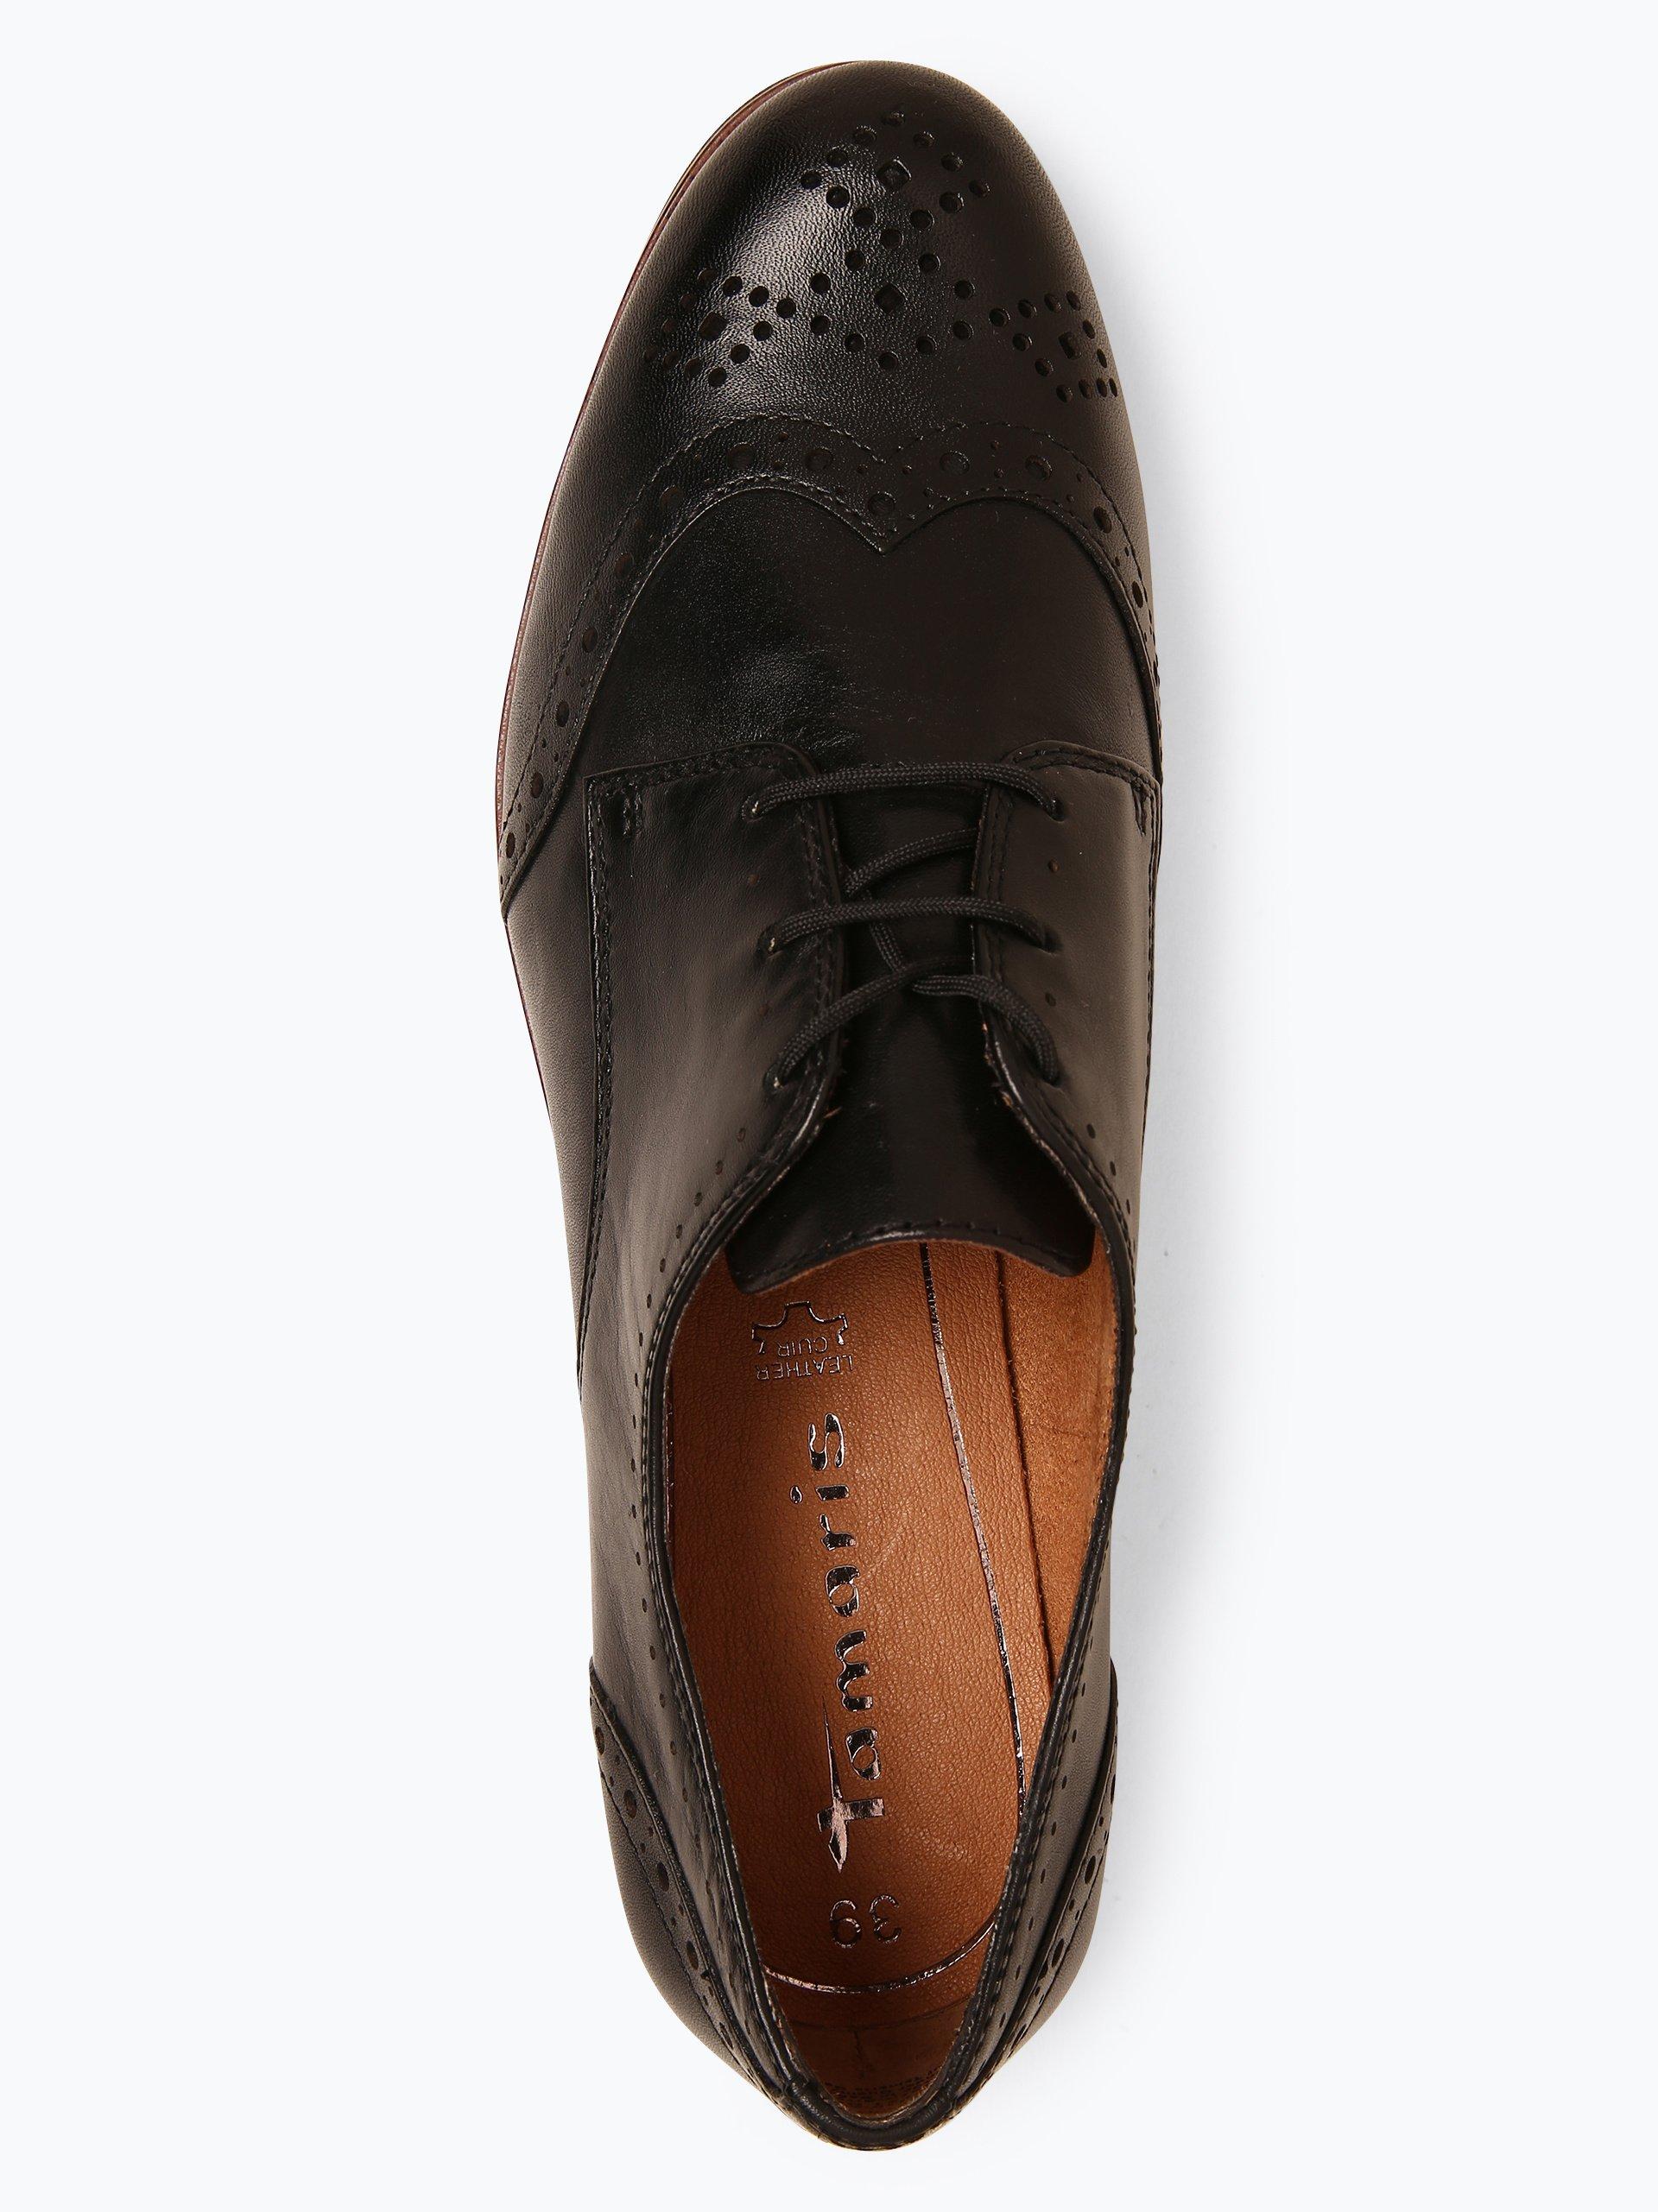 Tamaris Damen Schnürschuhe aus Leder